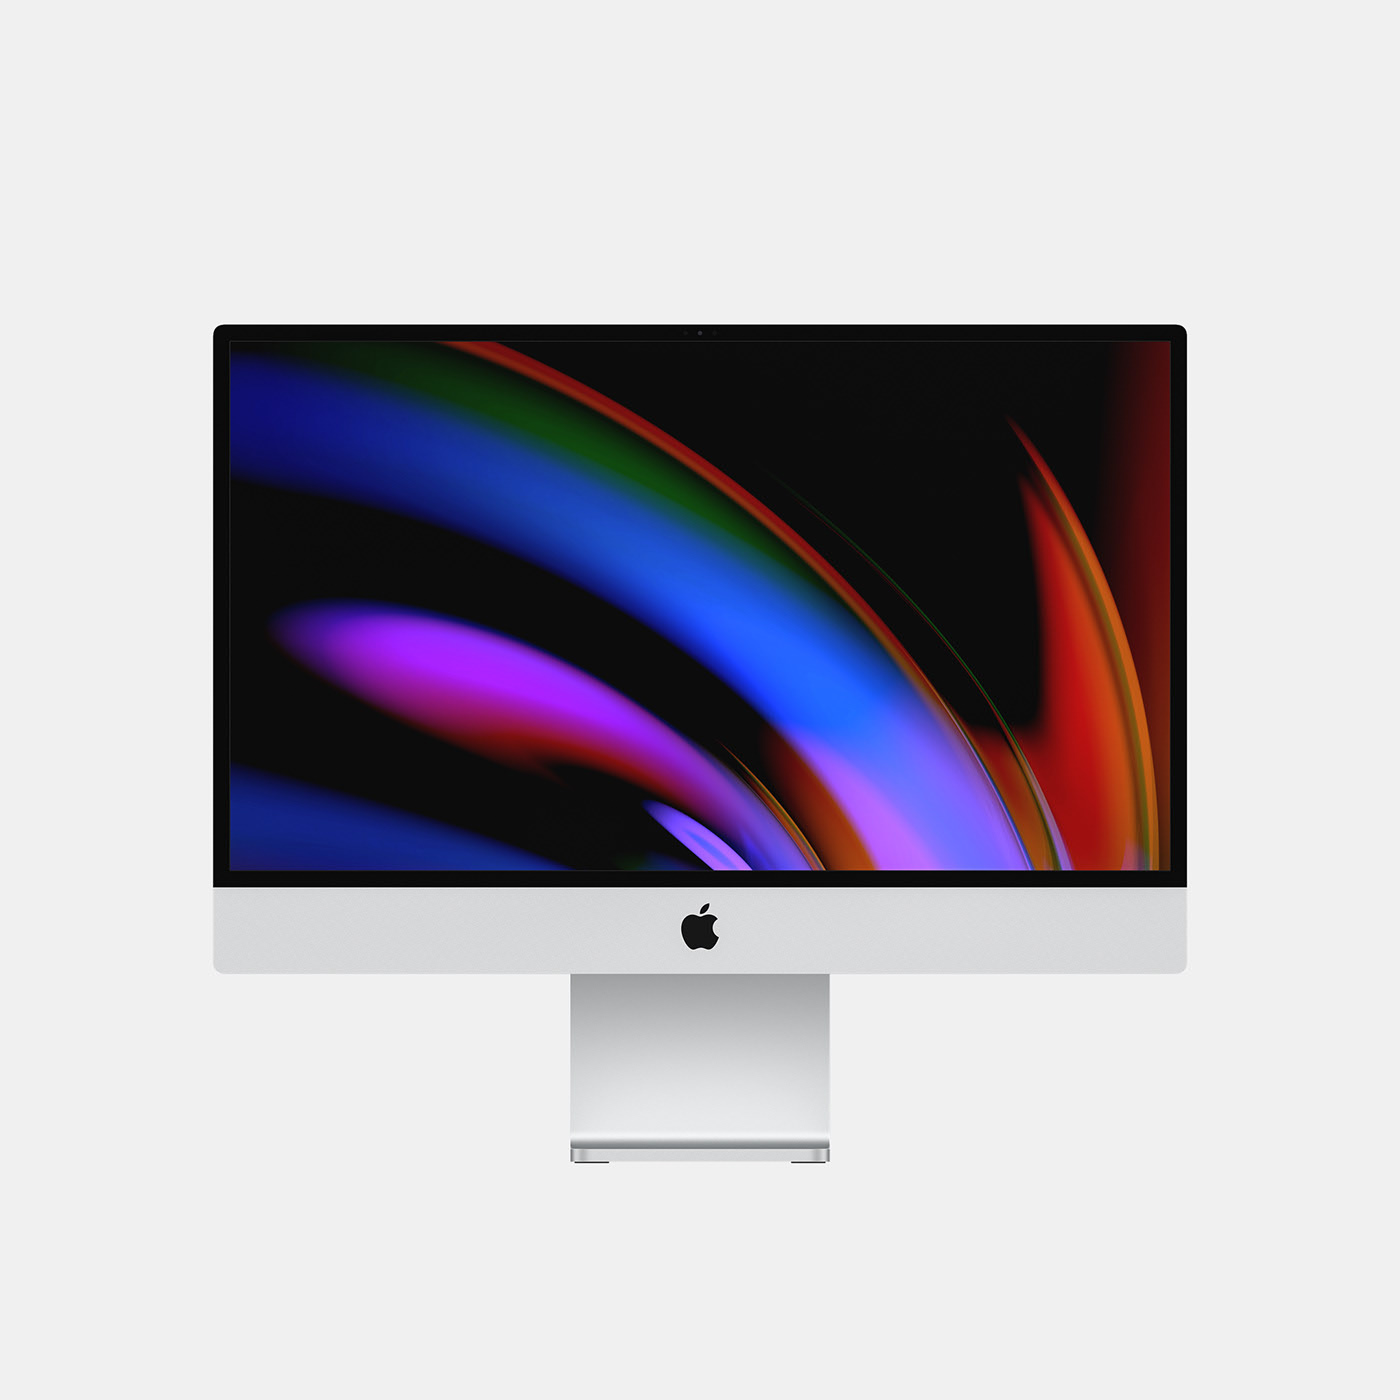 imac-concept-resembling-pro-display-xdr-12